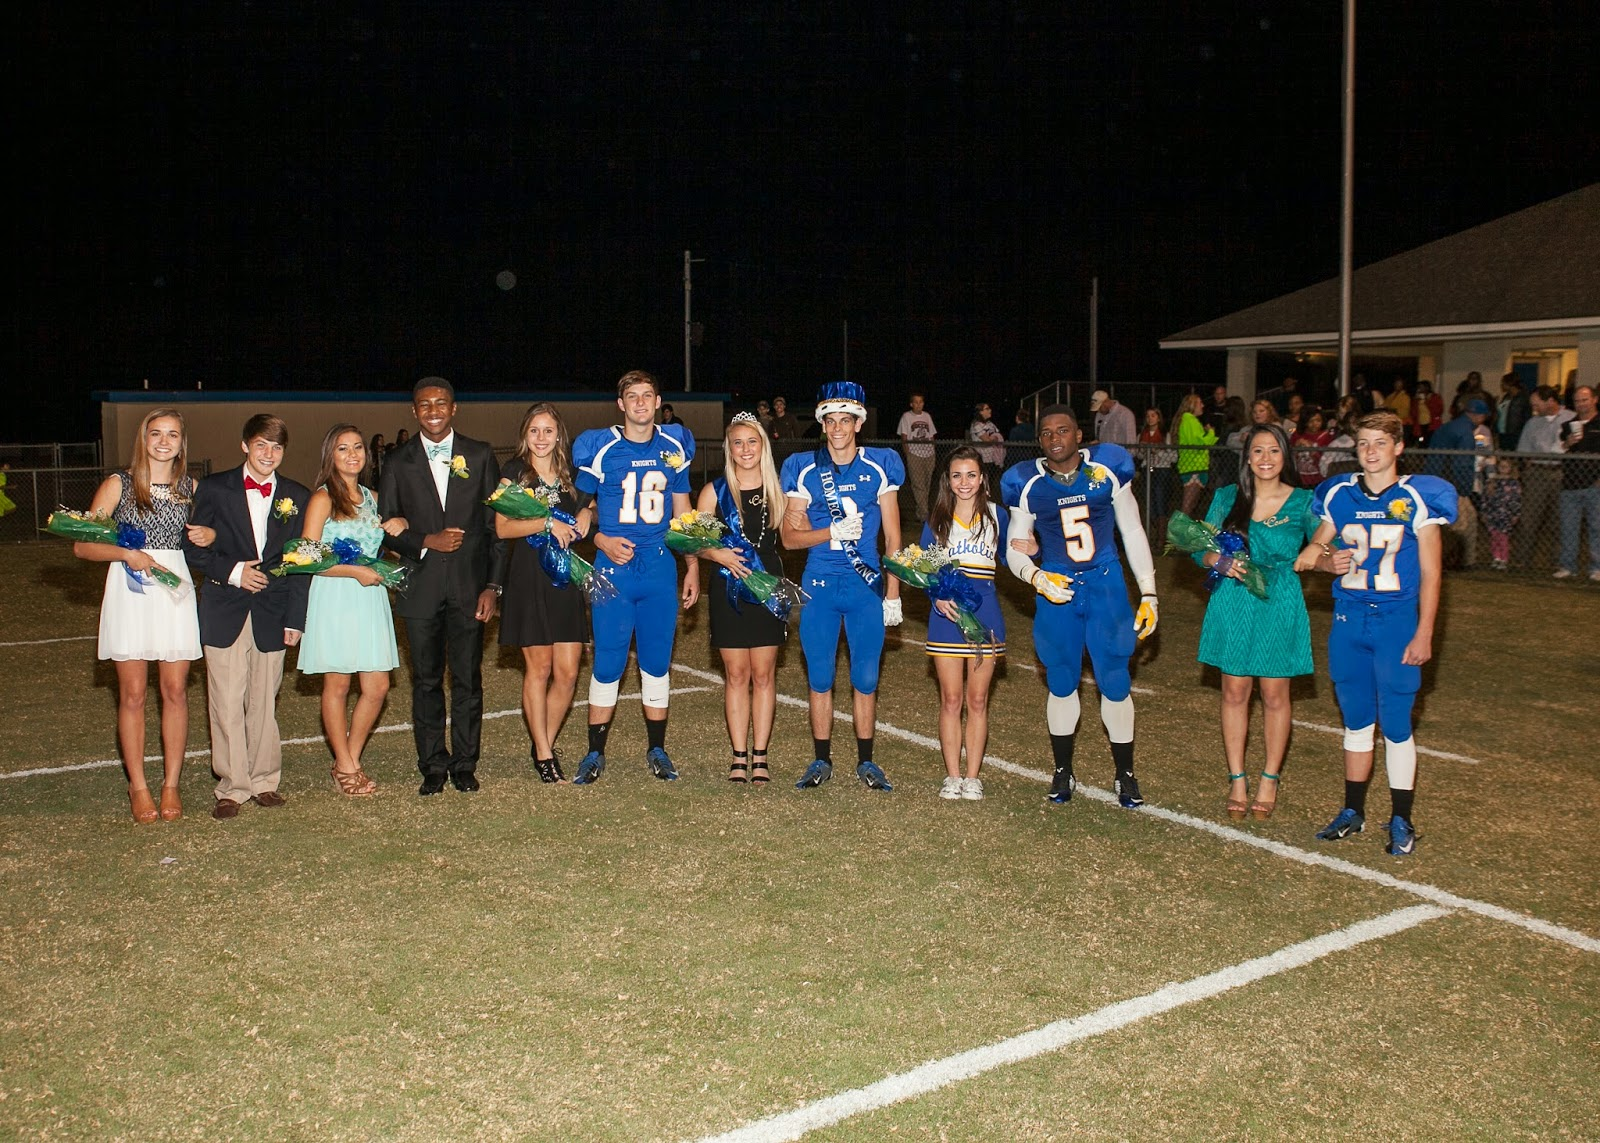 Montgomery Catholic Preparatory School Crowns 2014 Homecoming Queen & King 2